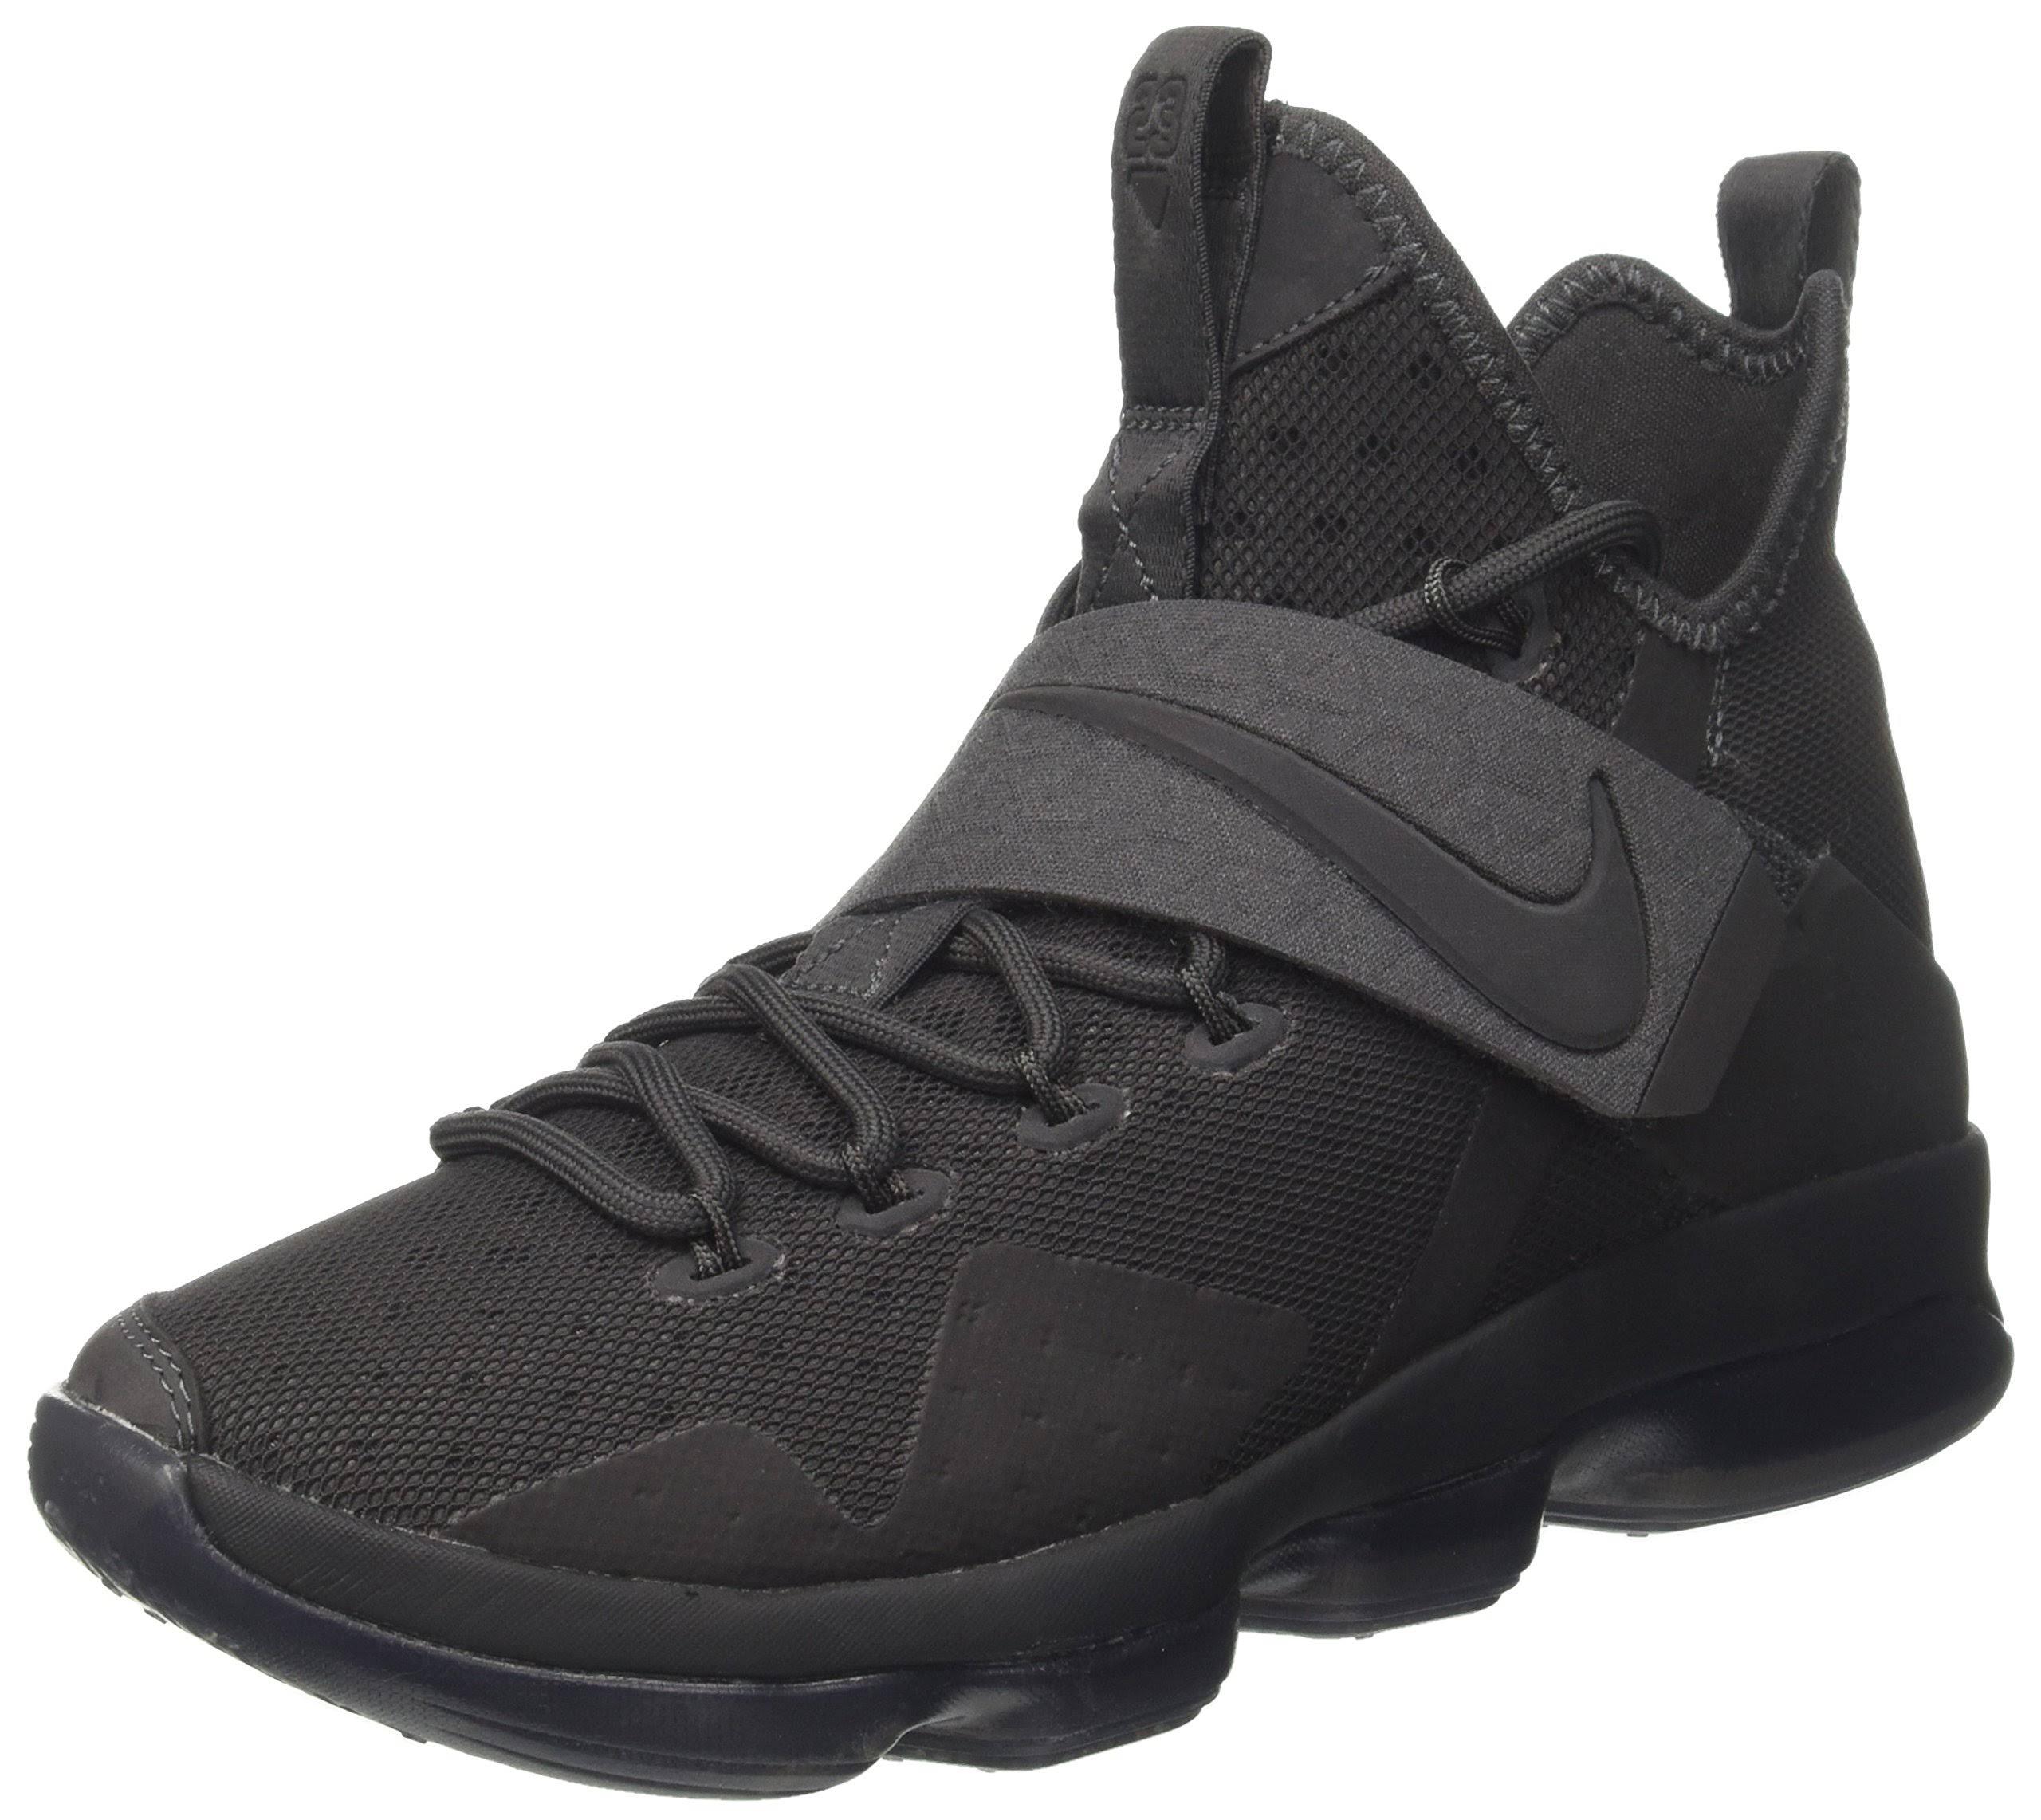 Thirty 852402 9 14 Anthrazit Zero 5 Dark Xl V Lebron Men Größe 002 Lmtd Nike qRpB0W